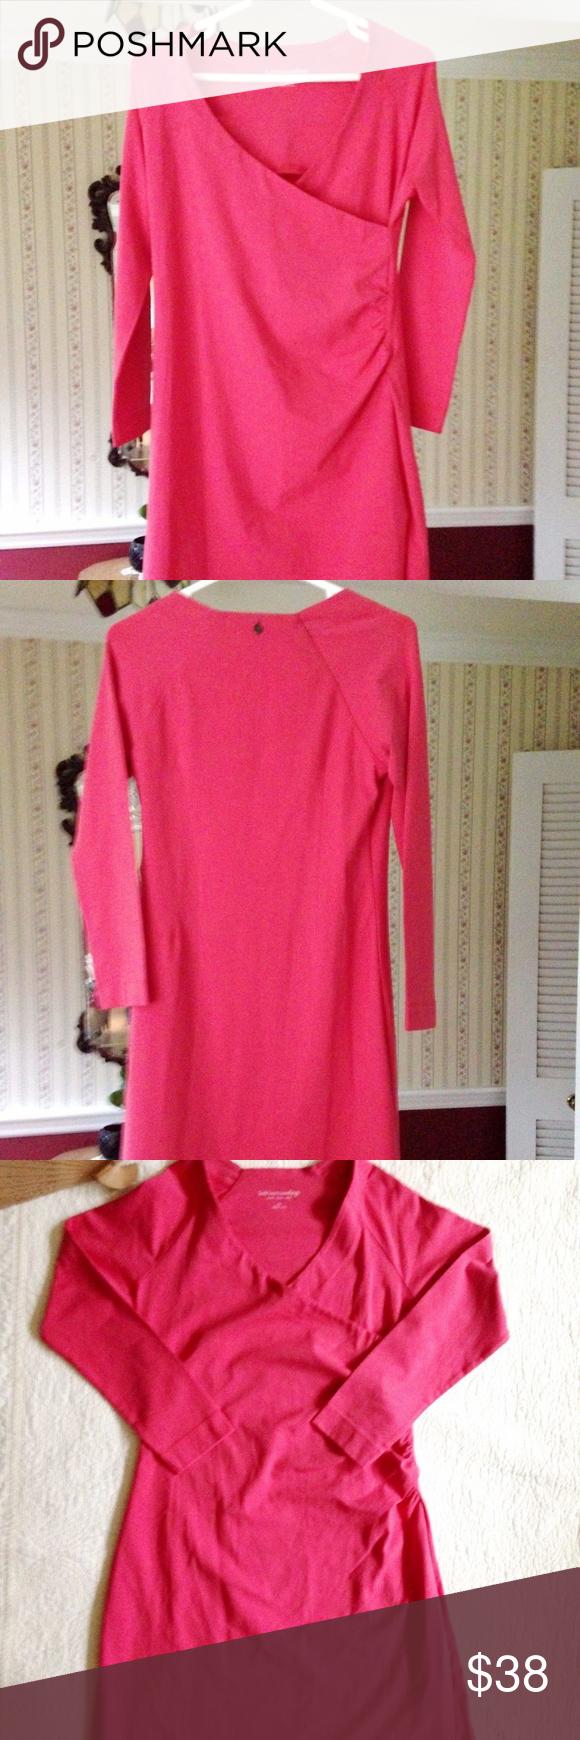 Soft Surroundings Dress C Faux Wrap Stretch Ps Size Runs Large Please See